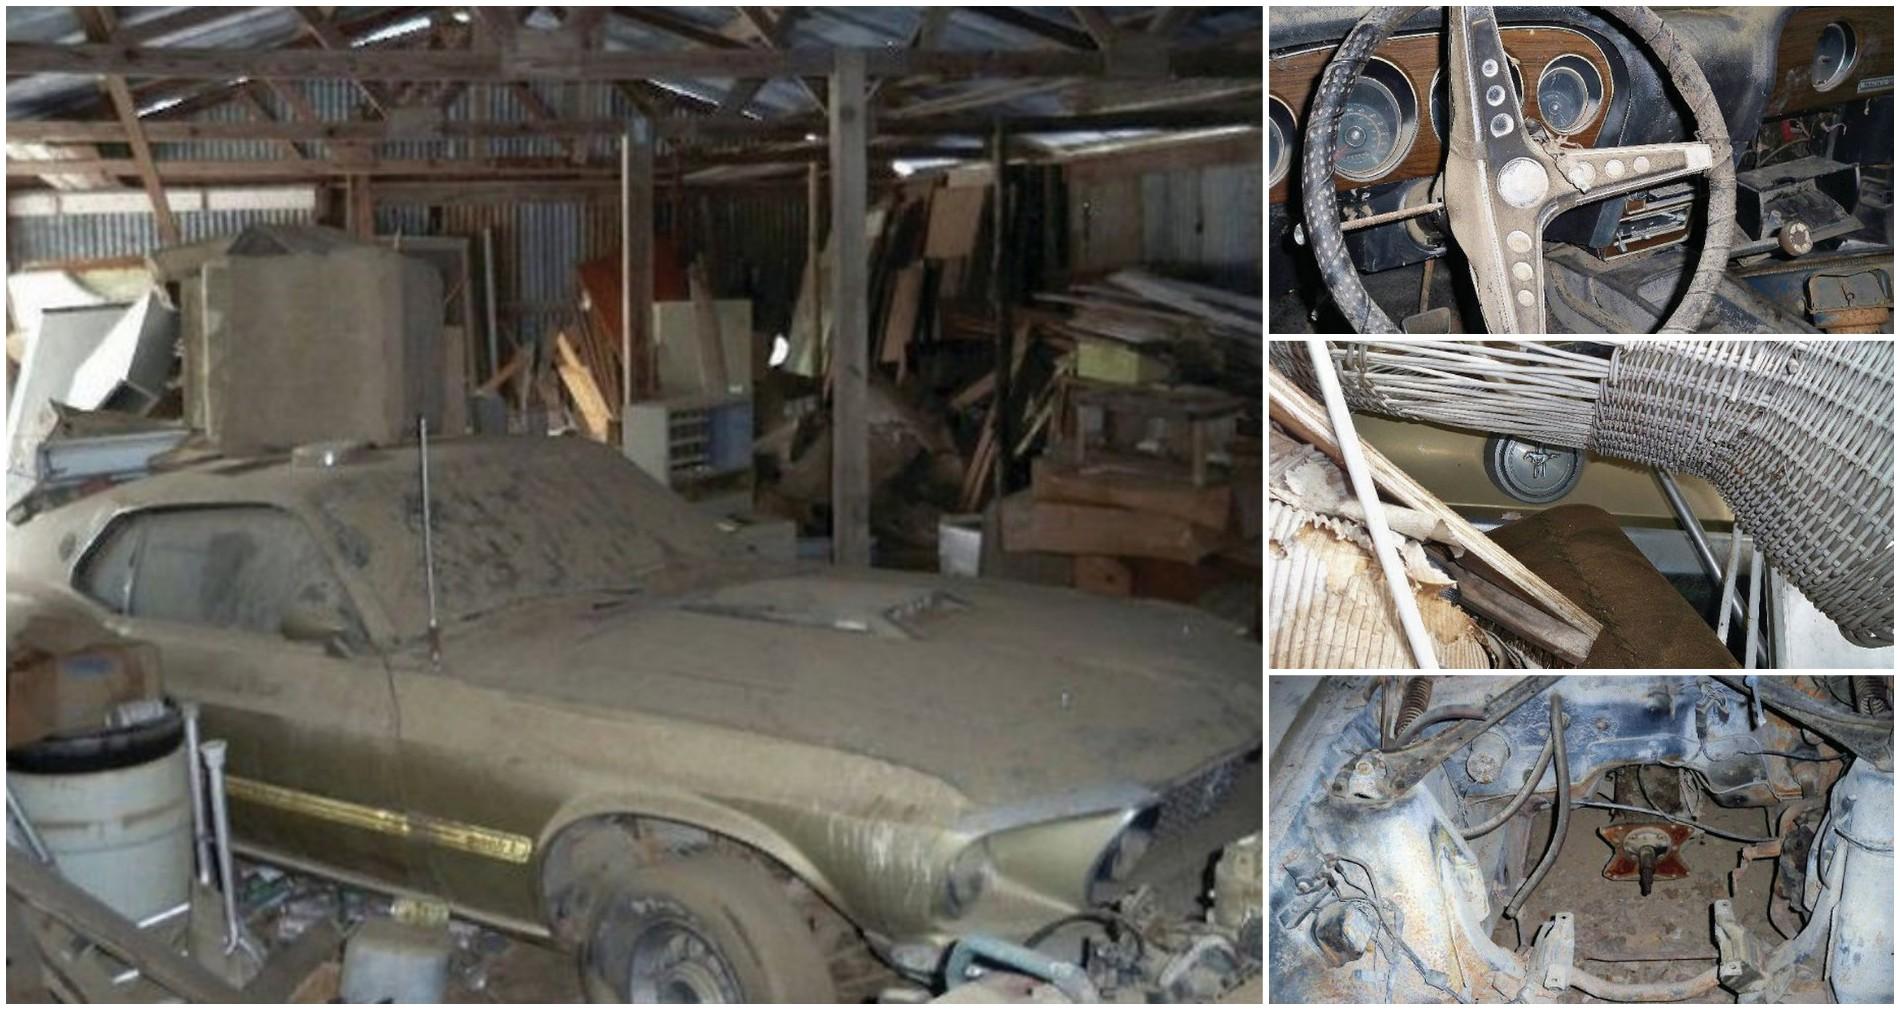 Barn find 1969 mustang mach 1 needs serious tlc autoevolution